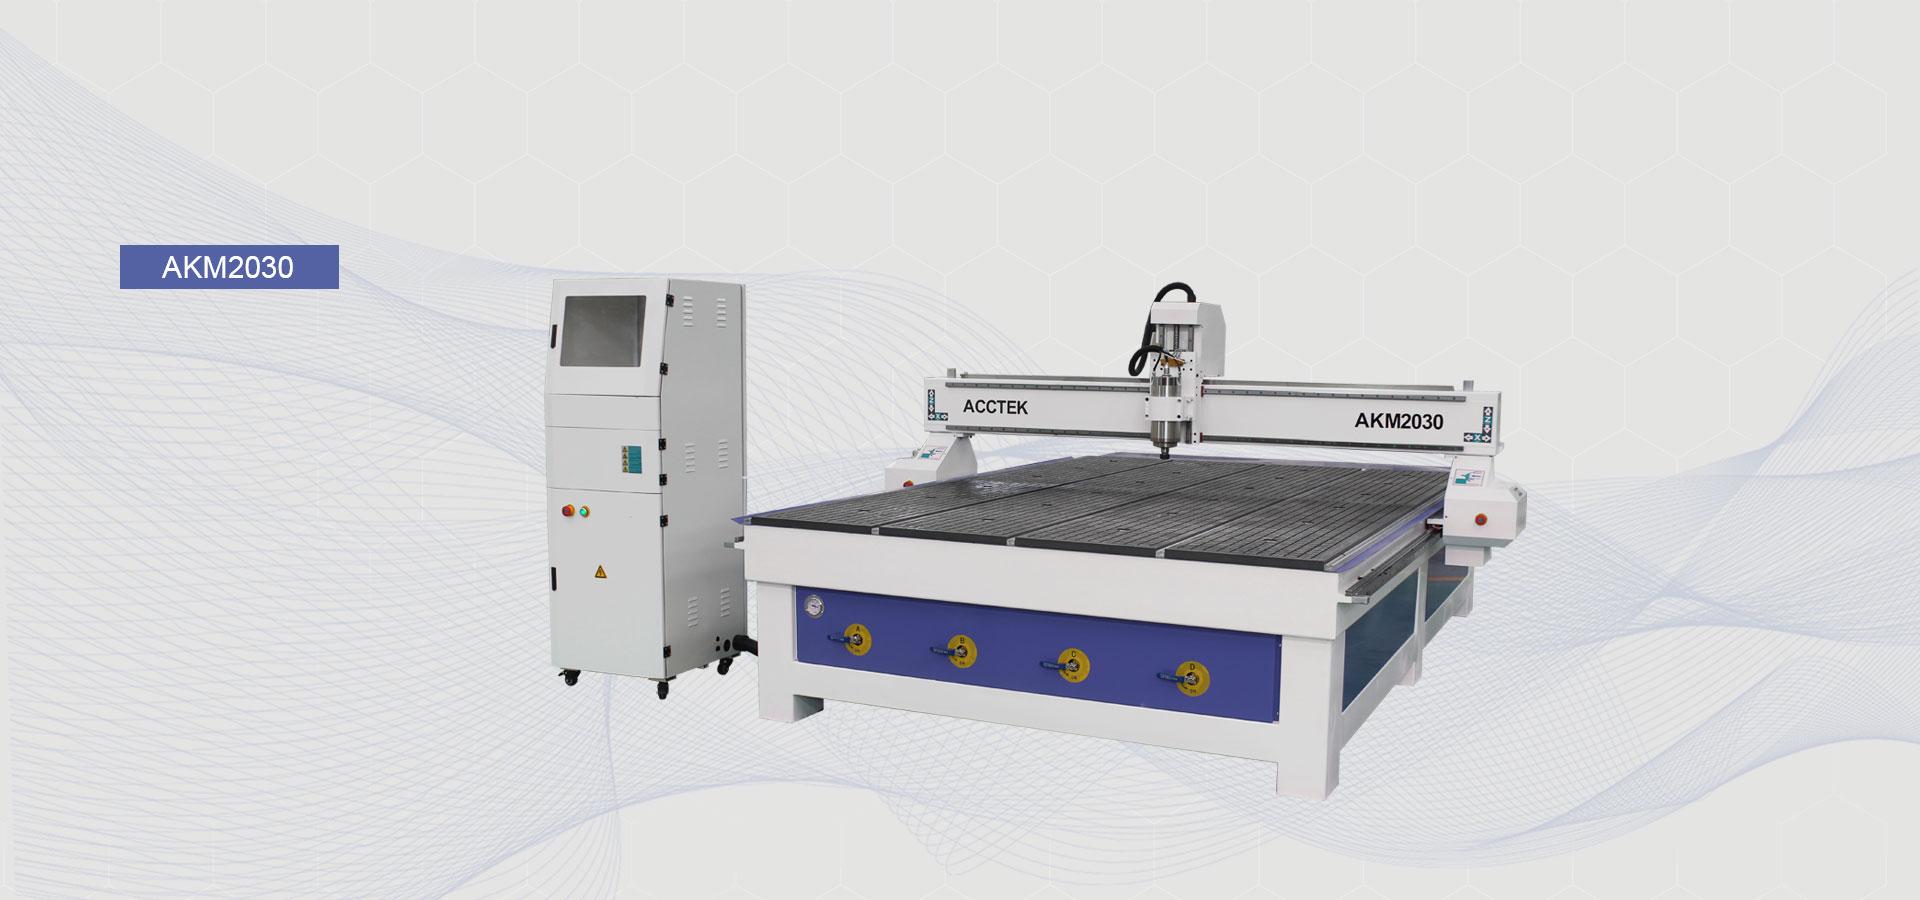 AKM2030